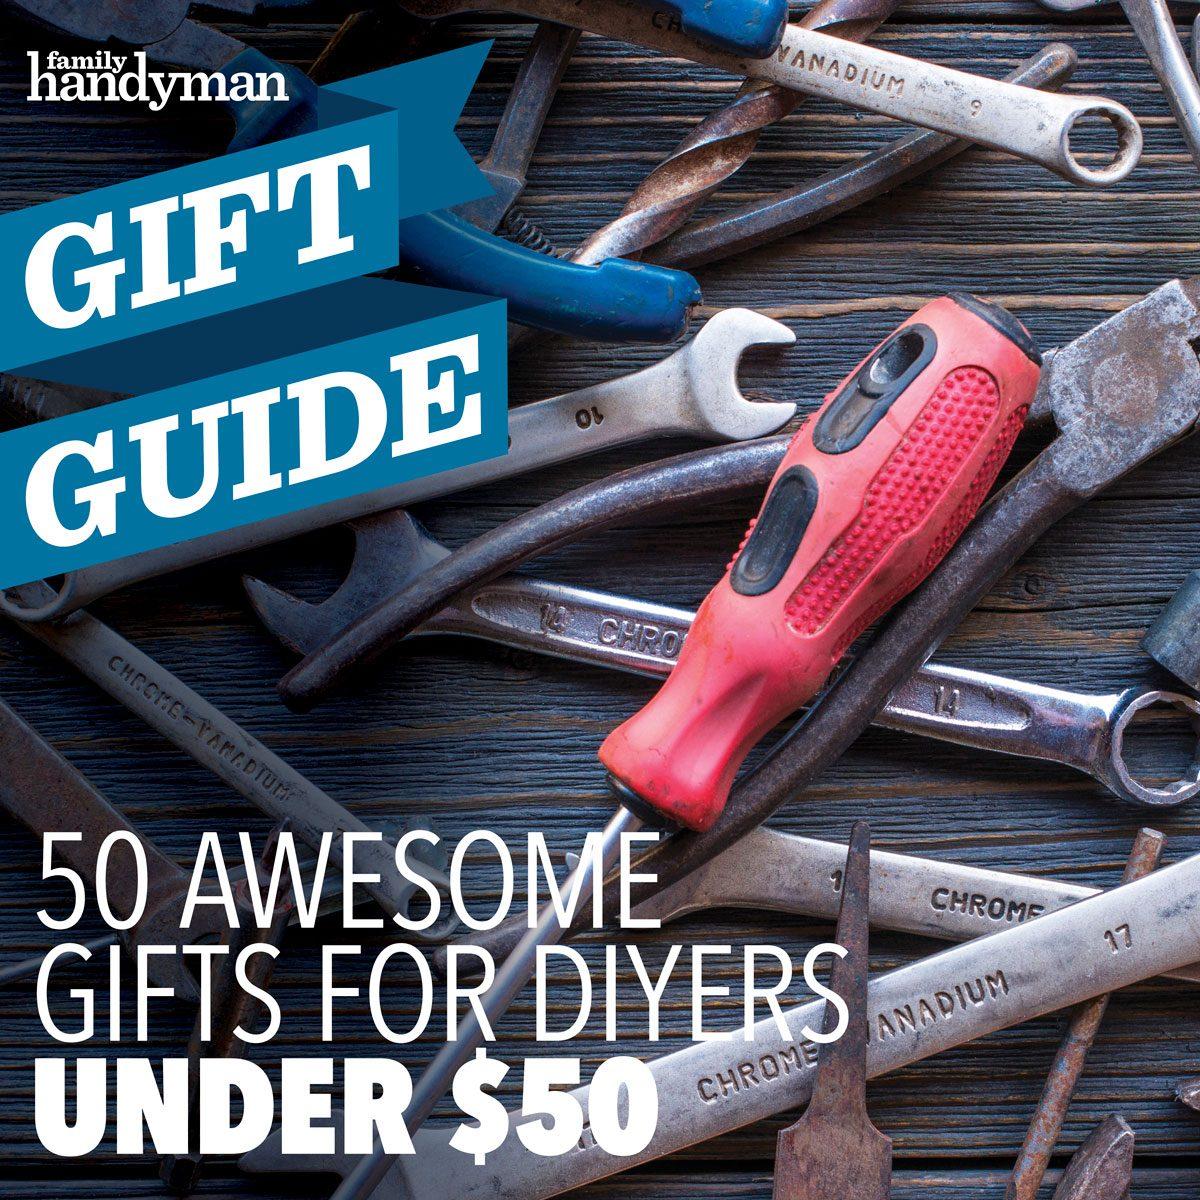 hammer handyman keychain tool keychain Tool keyring personalised handyman gift screwdriver handyman keyring tool gift carpenter gift